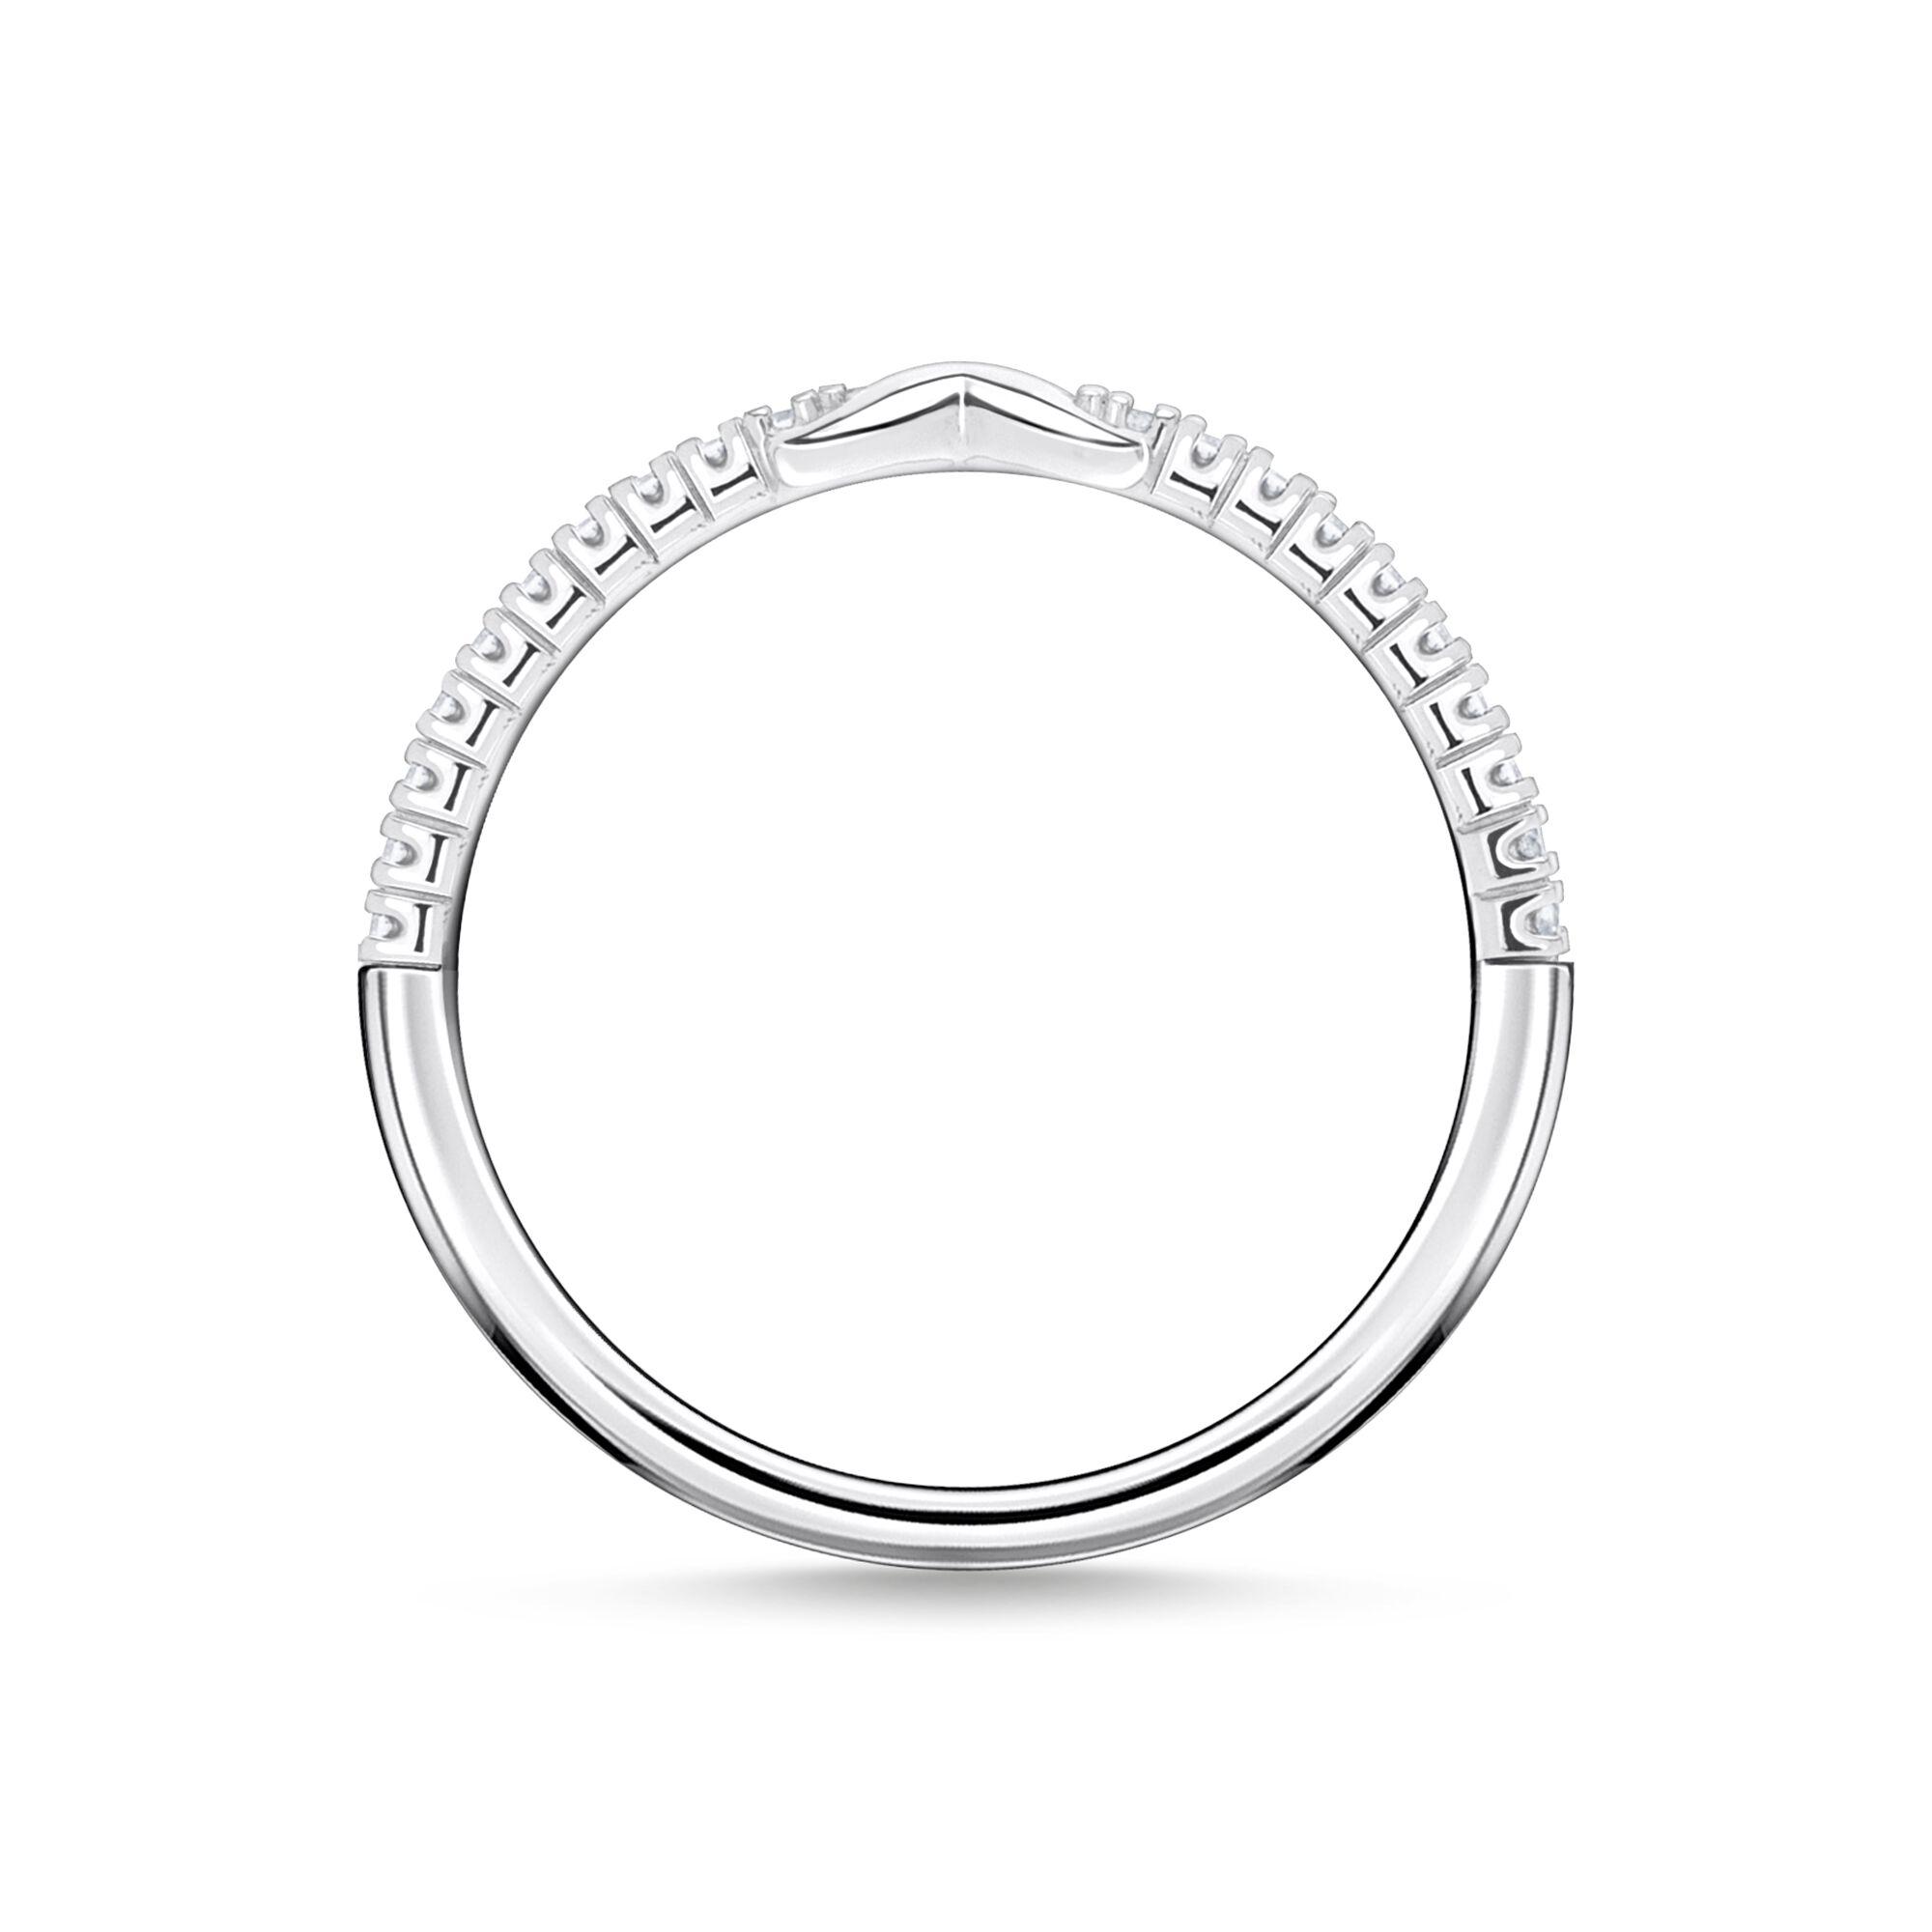 Bague Infinity avec pierres blanches argent Thomas Sabo